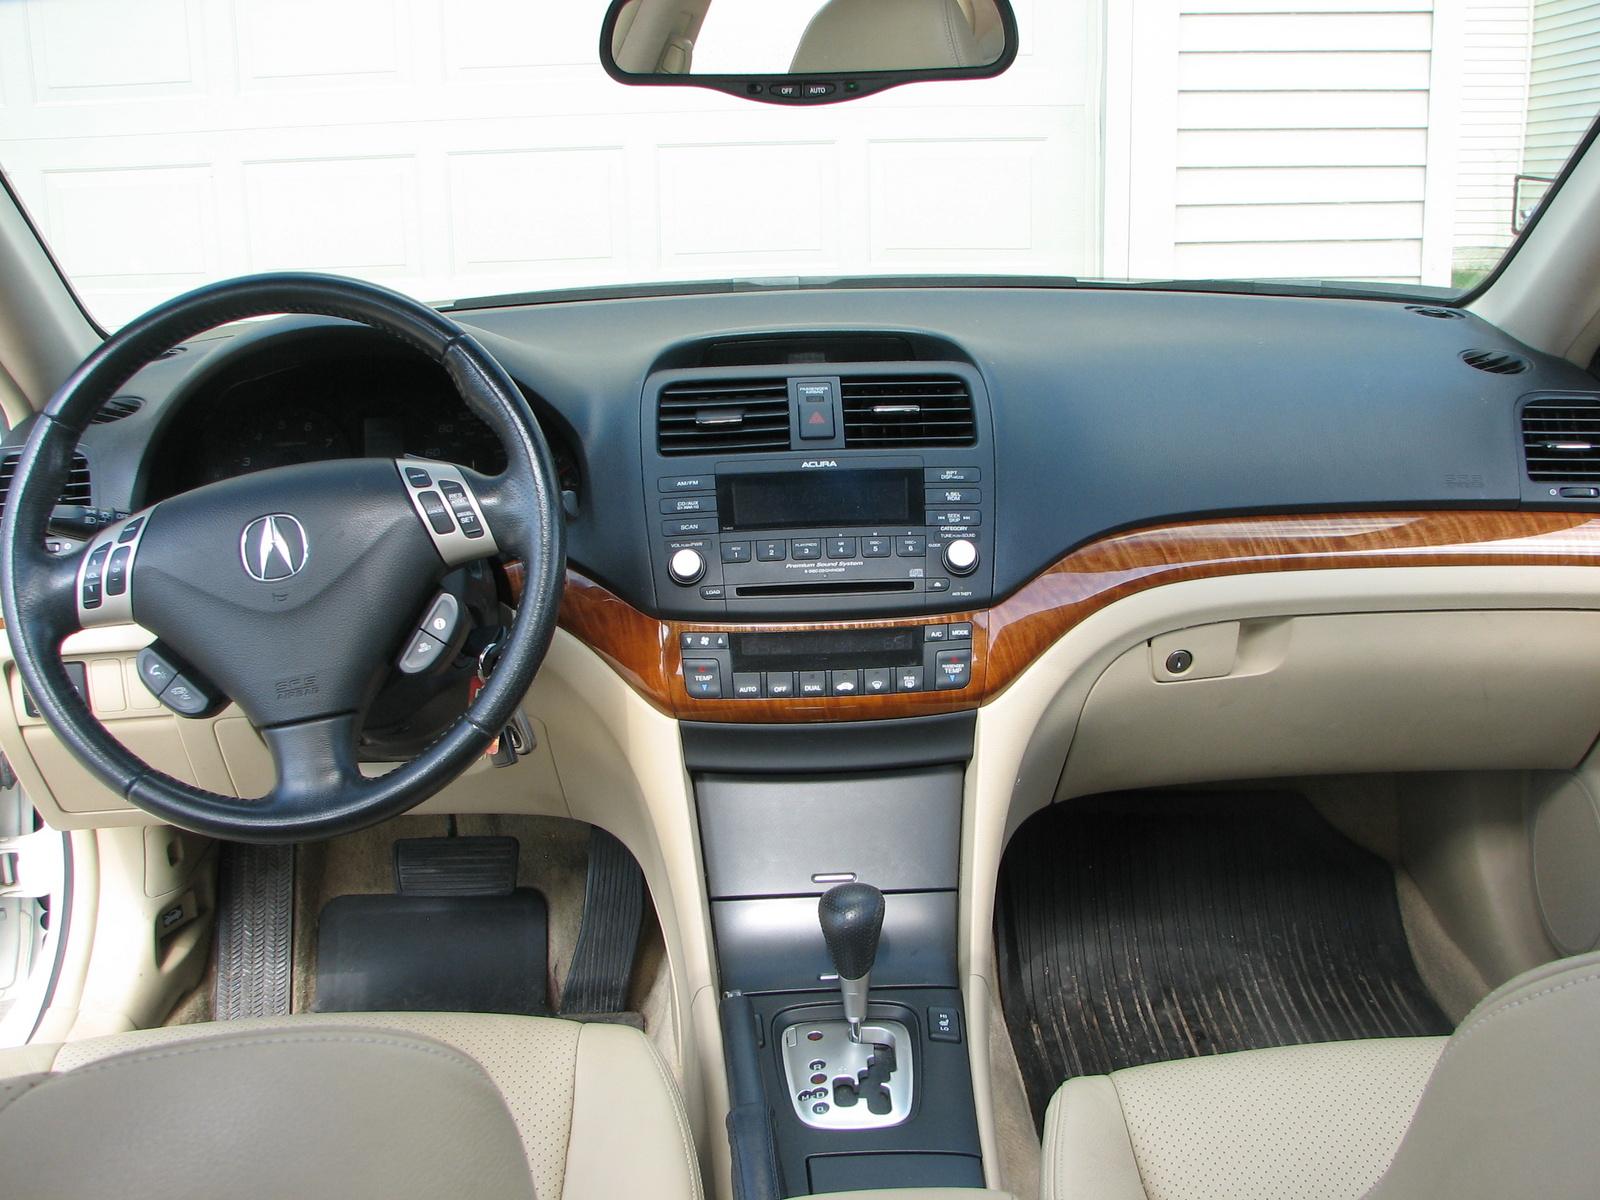 2008 Acura Tsx Interior Billingsblessingbags Org